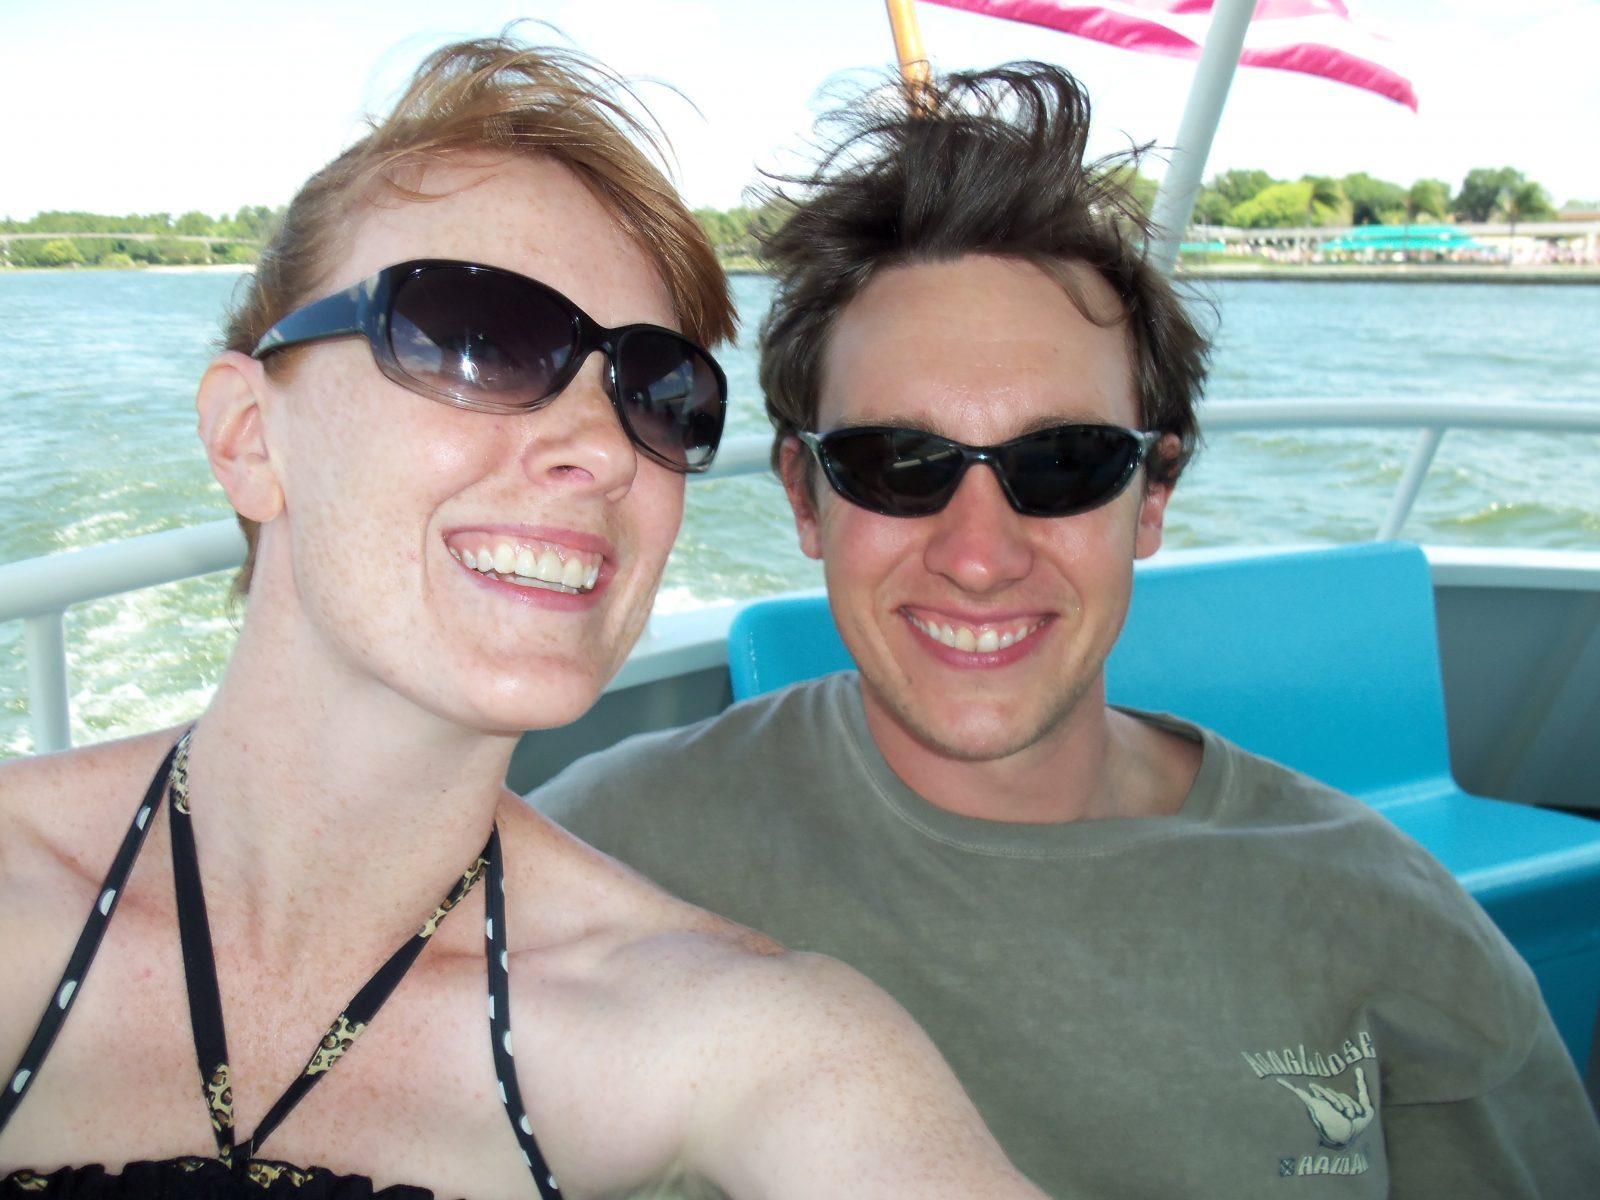 couple enjoying a boat ride at disney